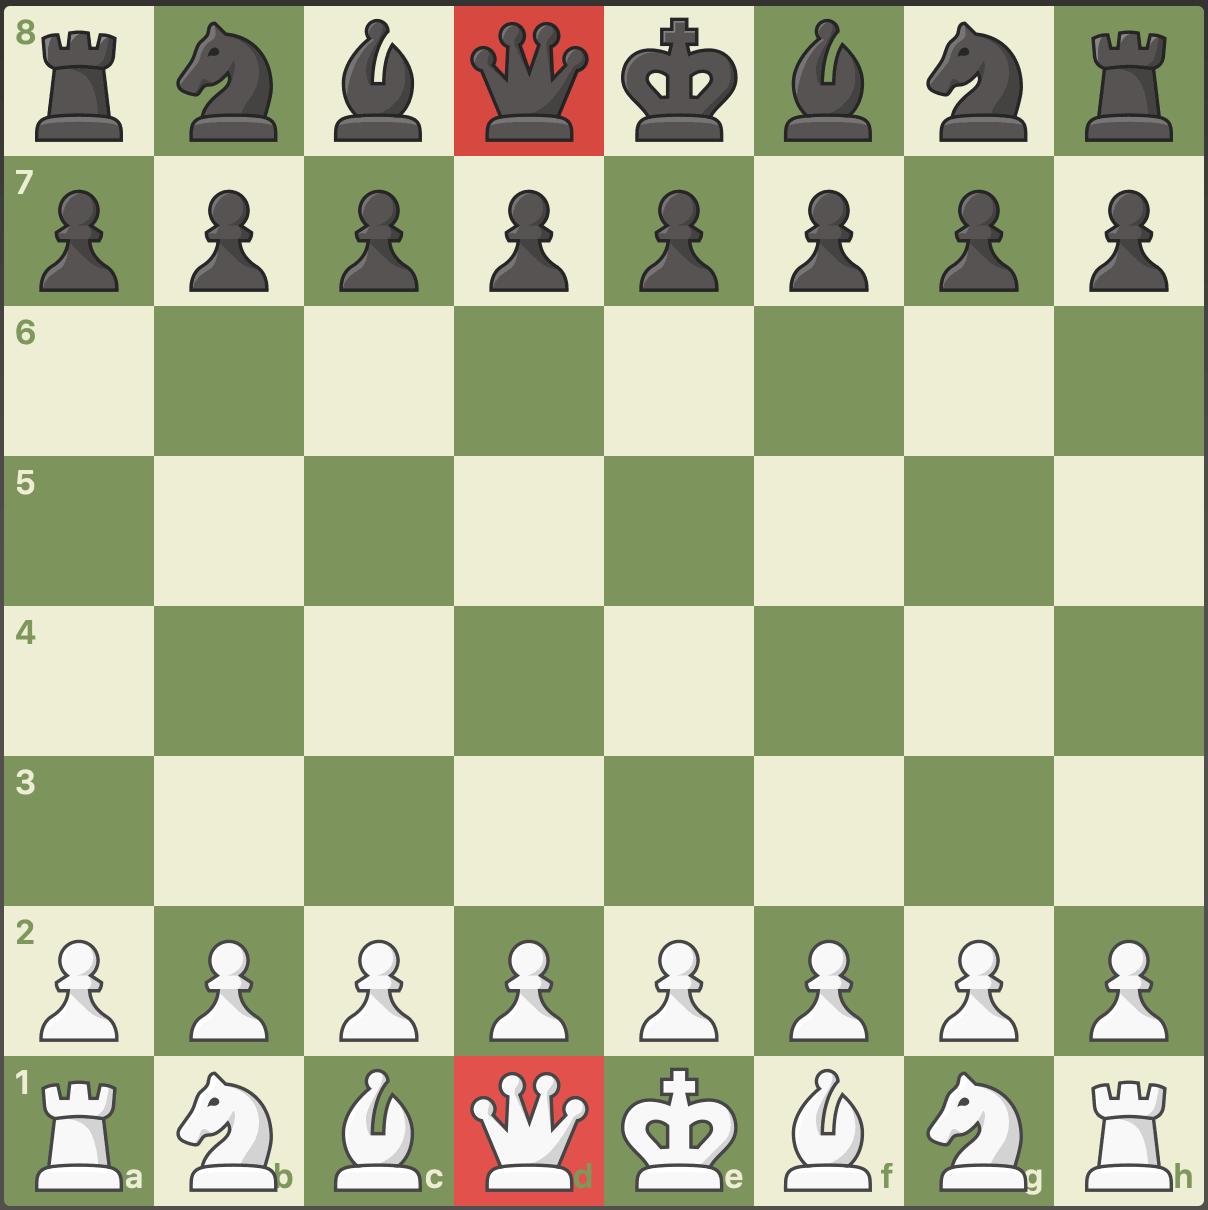 queen starting position